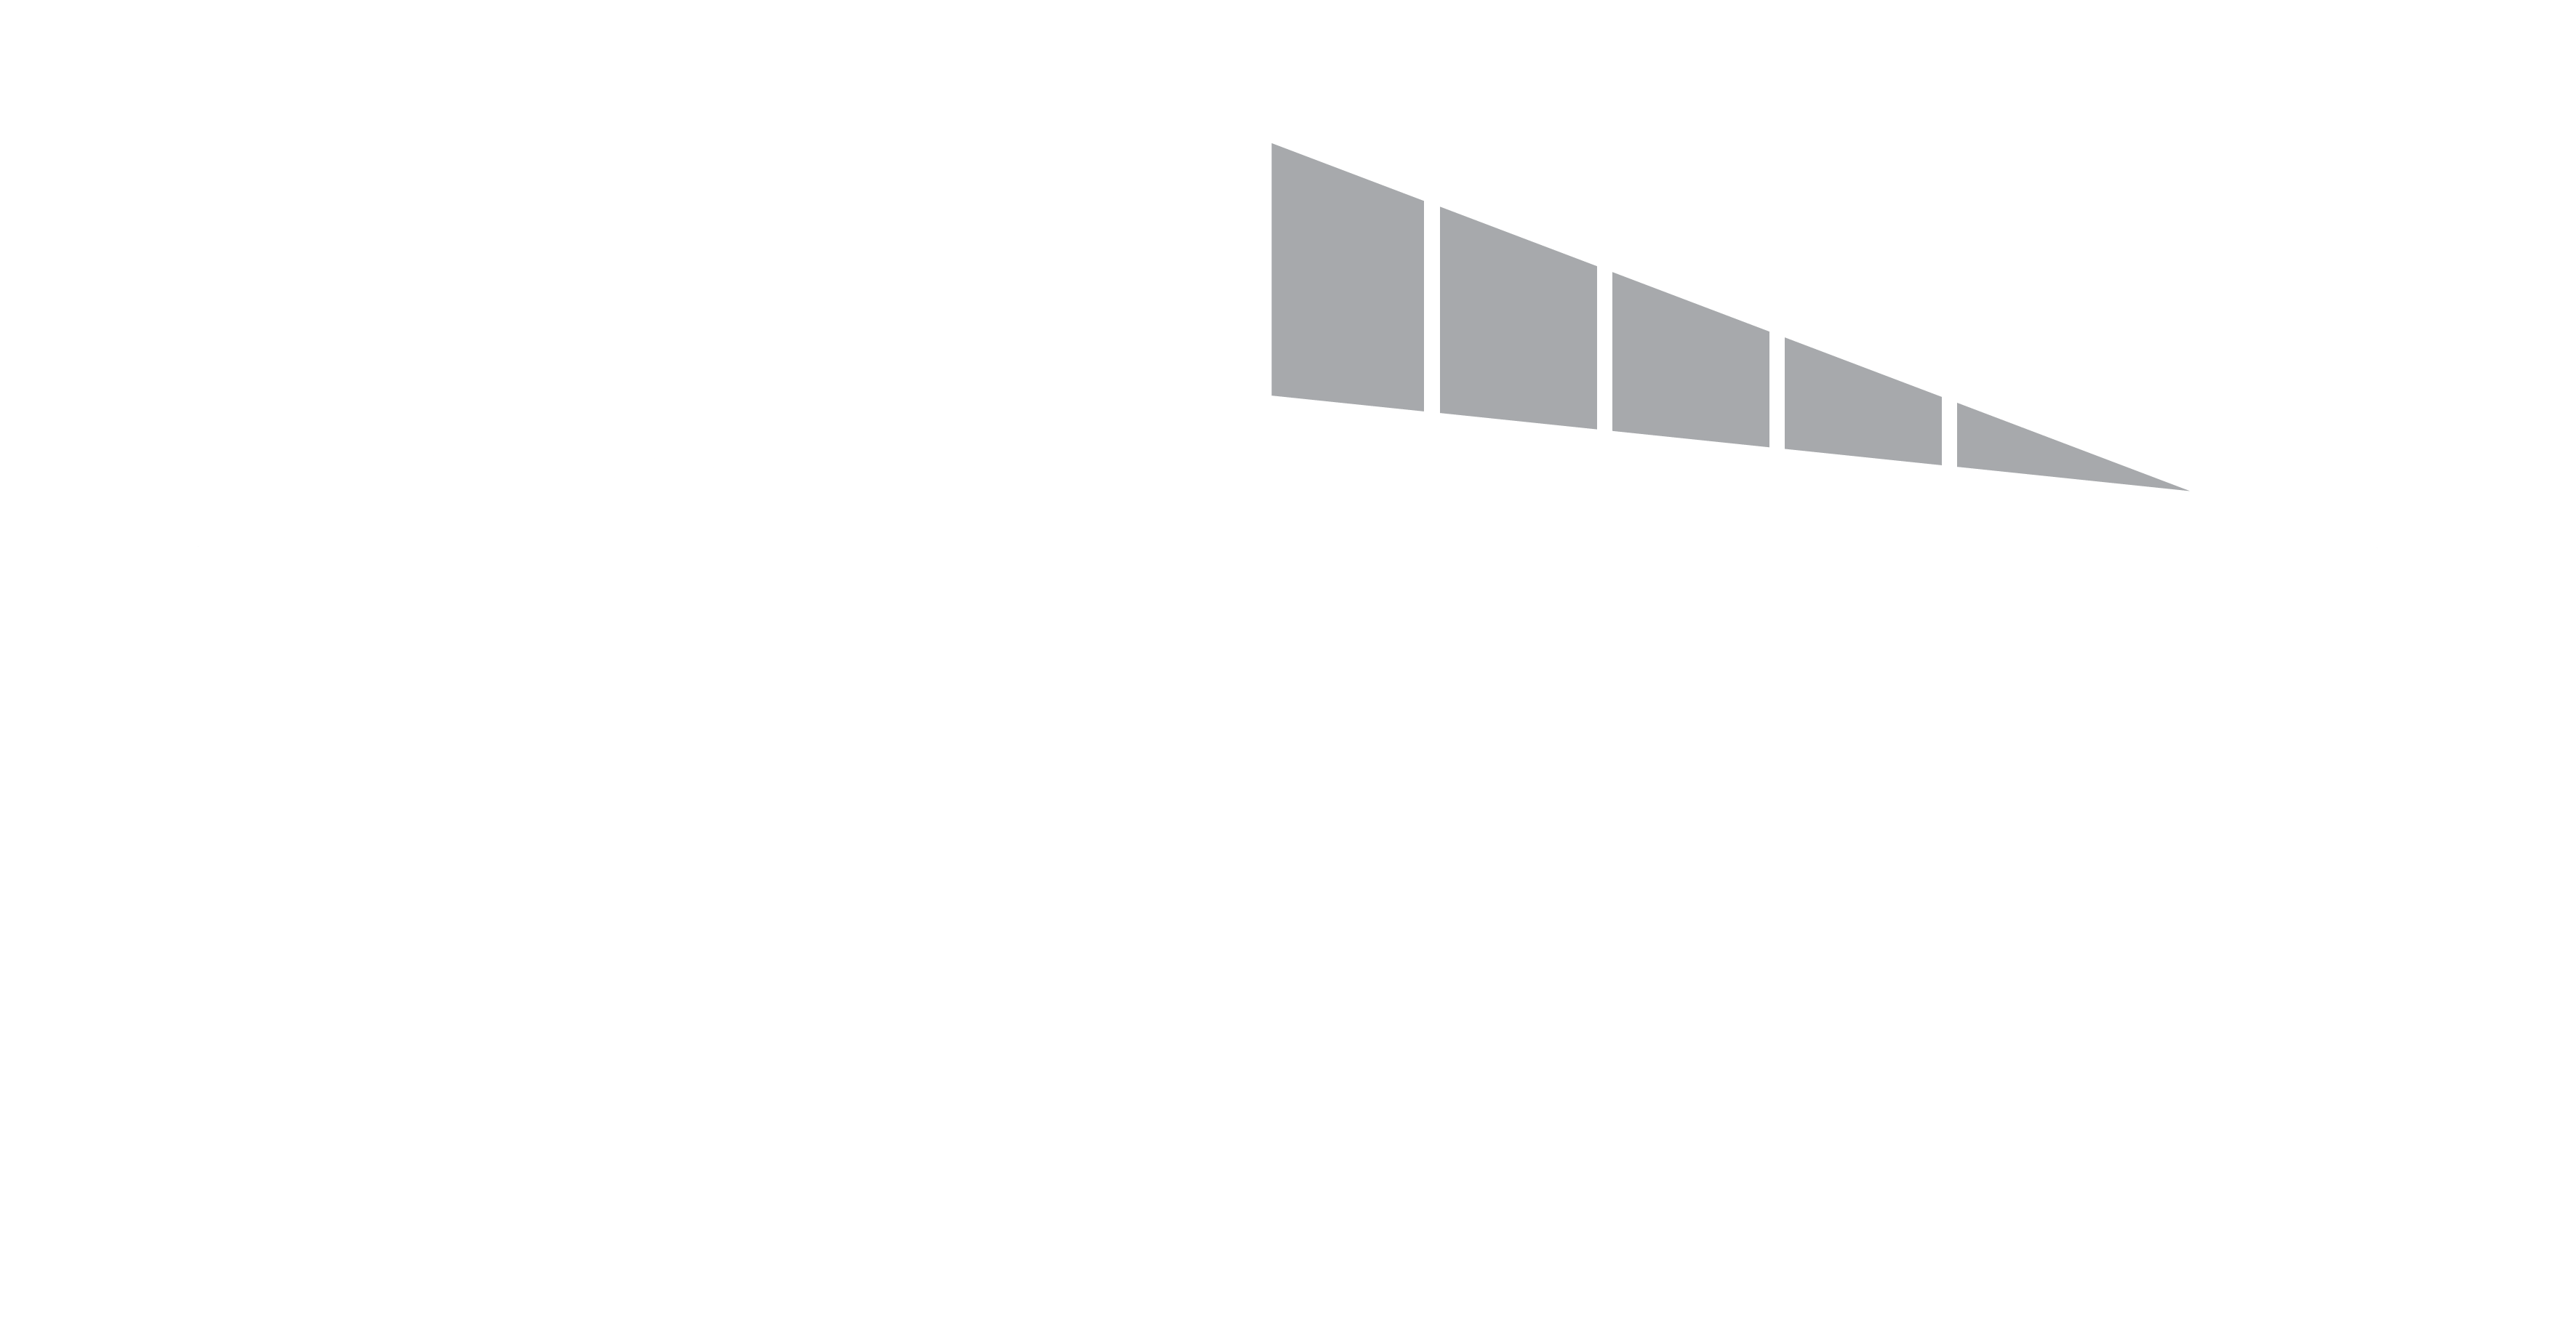 The Wall That Heals – Minnesota Remembers Vietnam